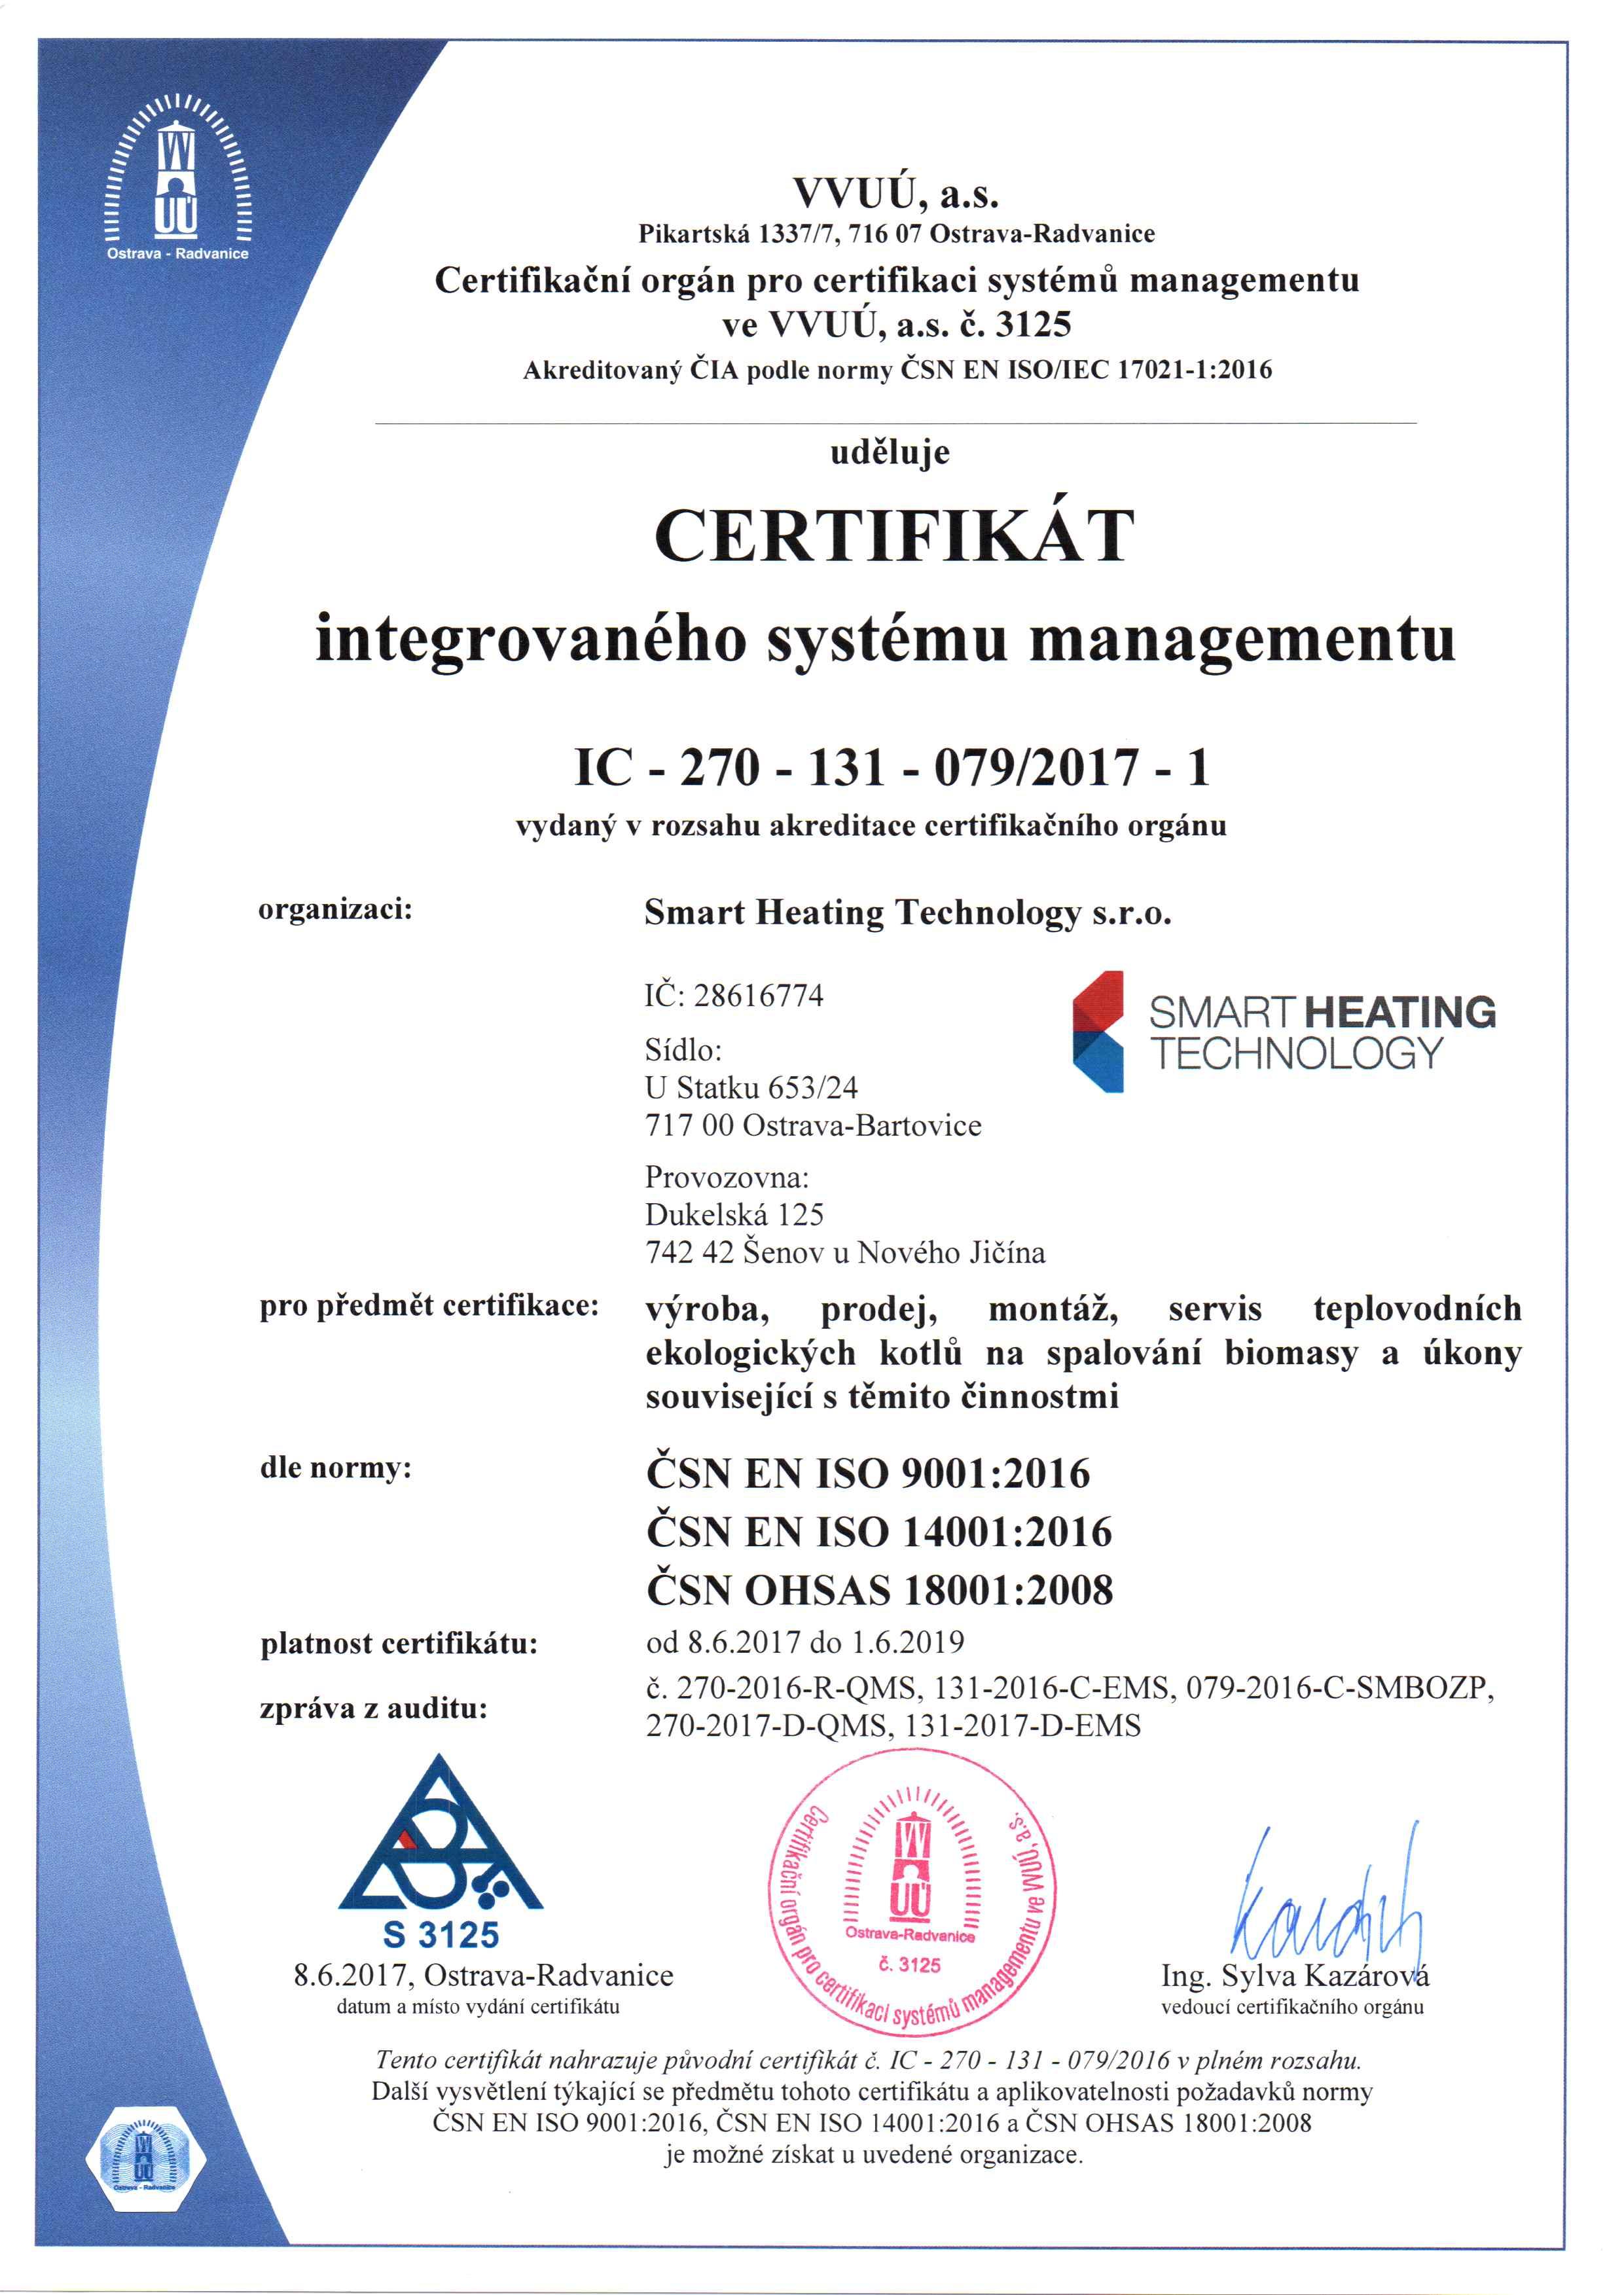 certifikat-ic-270-131-079_2017-1-cz-integrovaneho-systemu-managementu_stranka_1